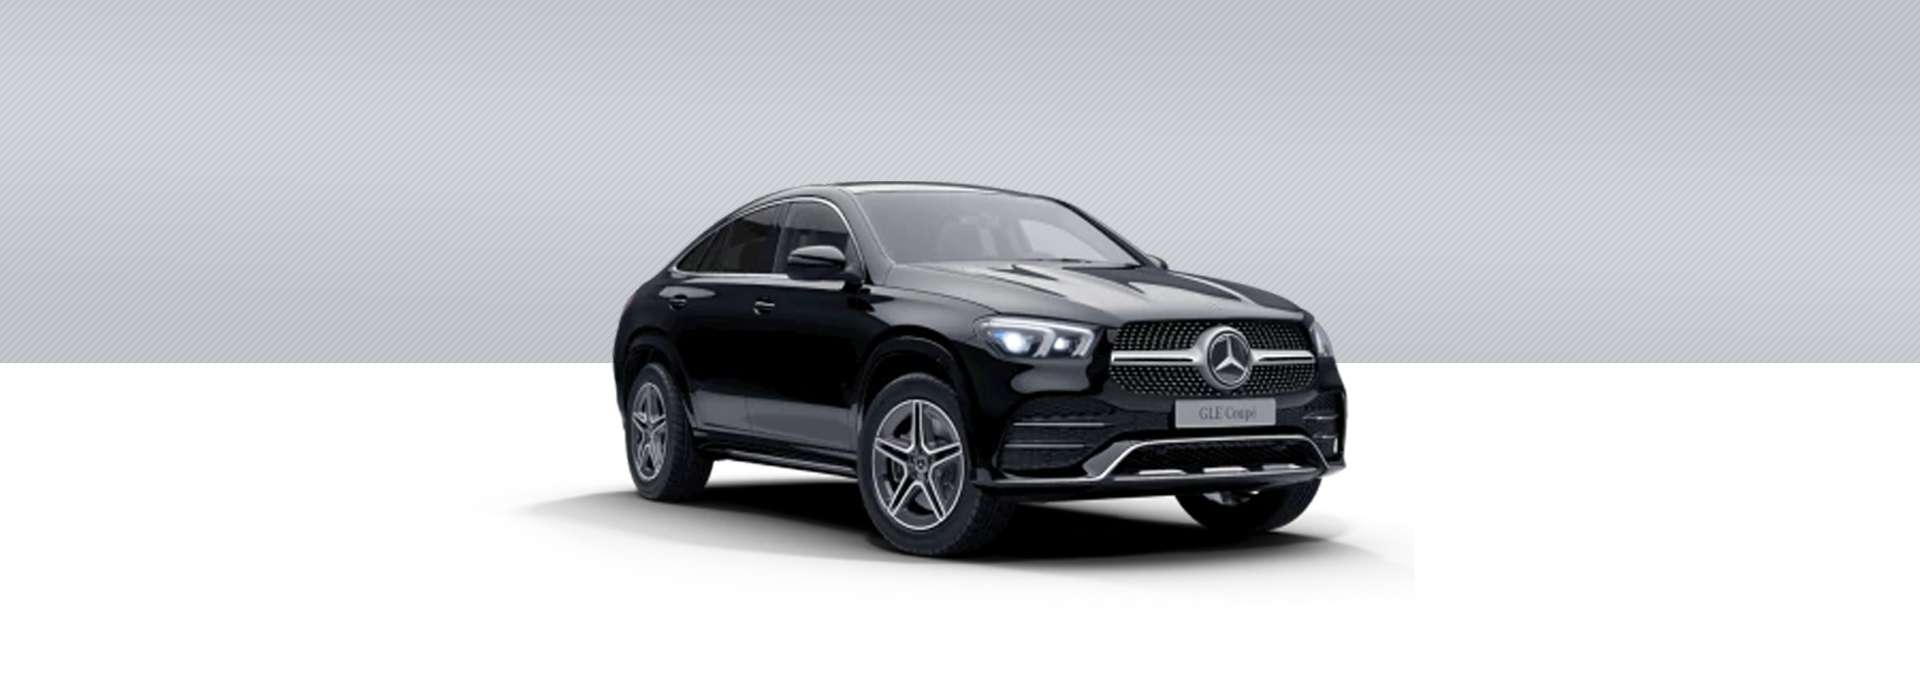 Mercedes Benz NUEVO GLE COUPÉ